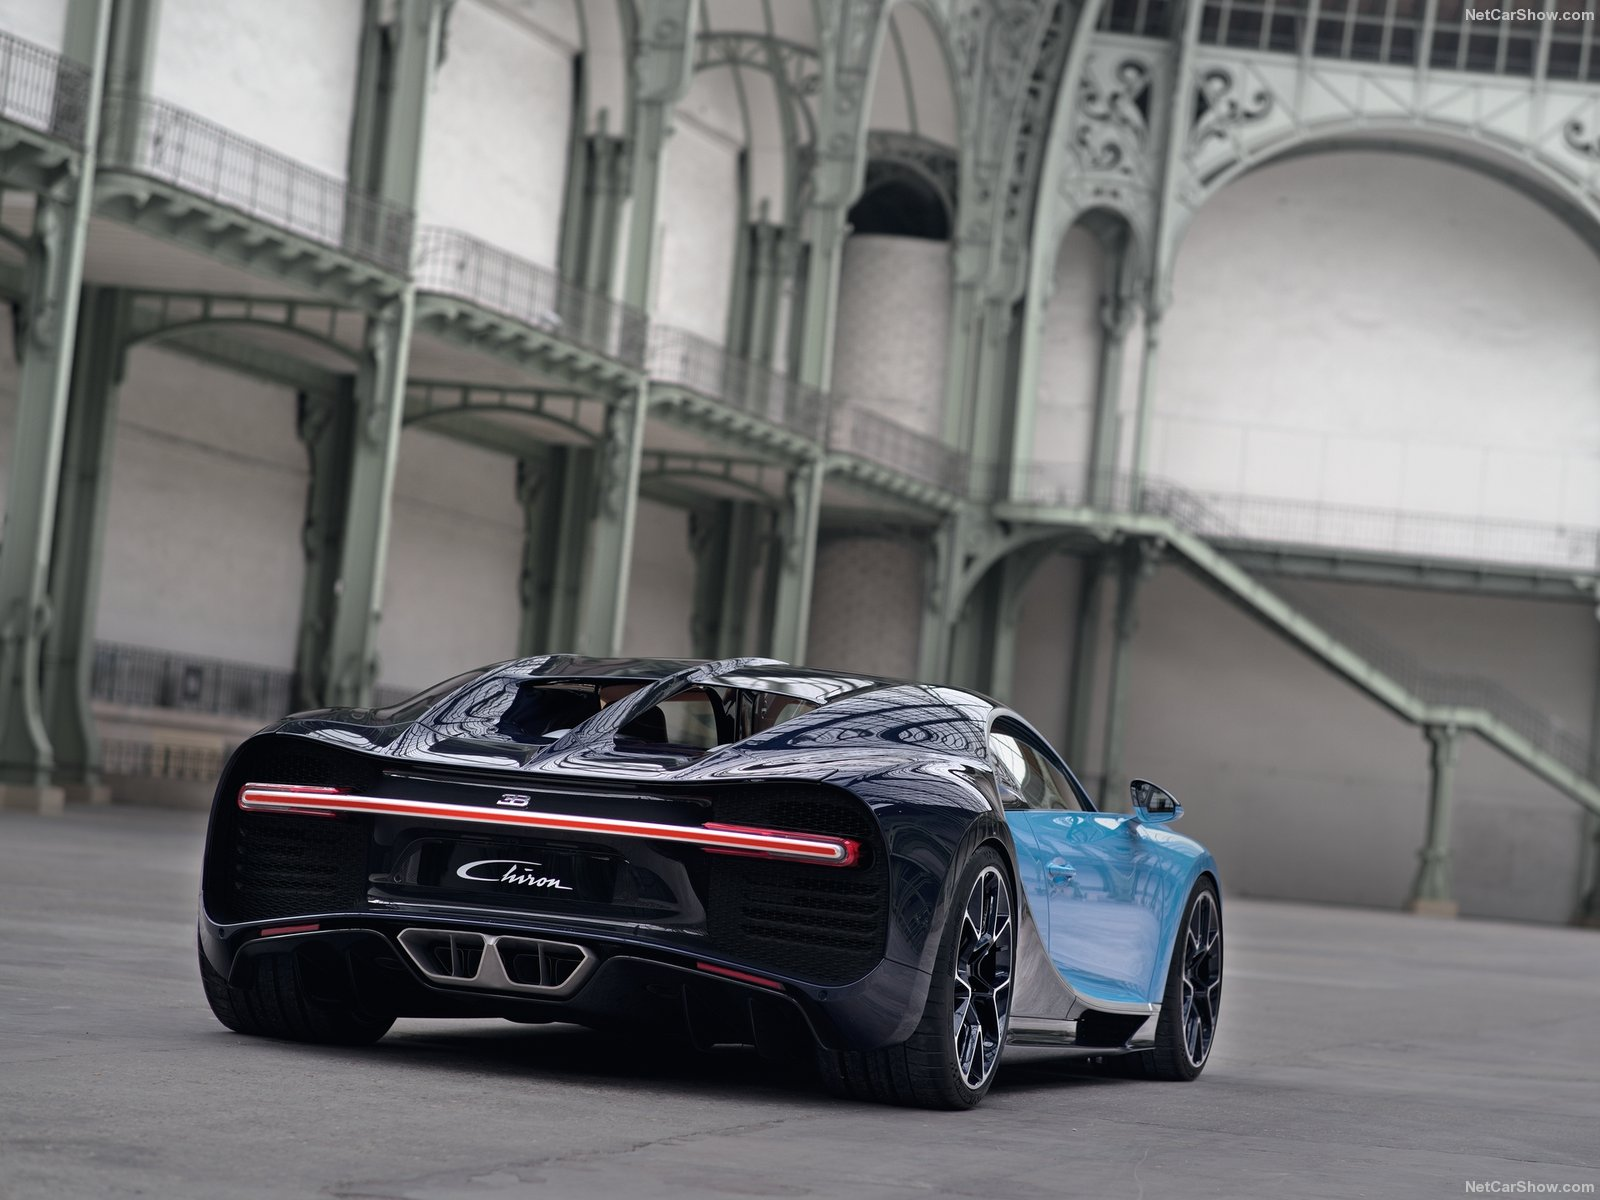 Bugatti-Chiron_2017_1600x1200_wallpaper_18